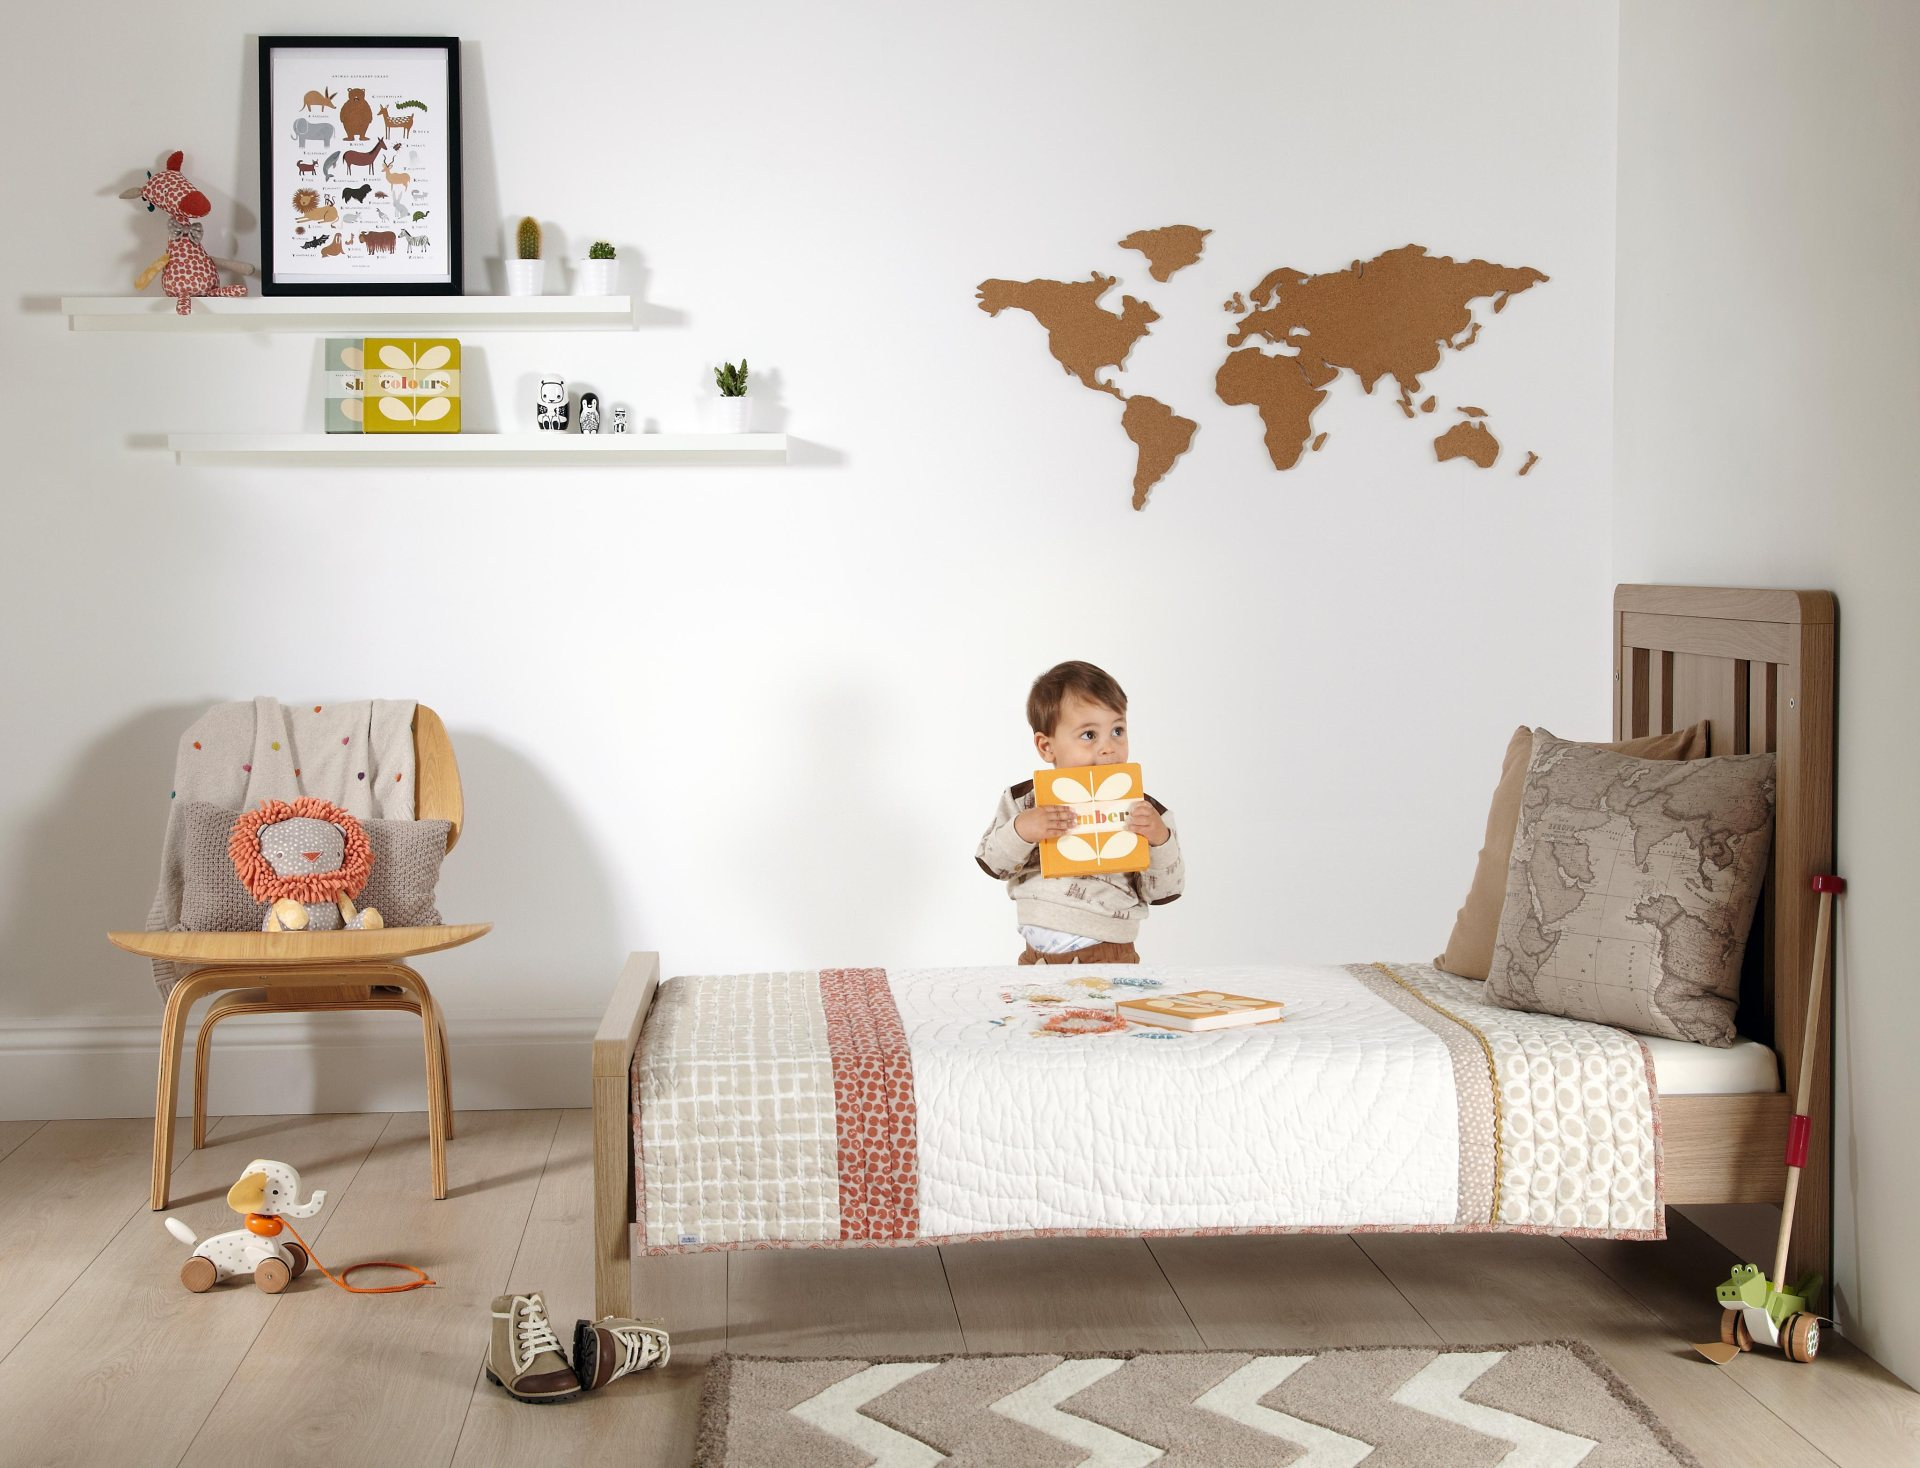 ZBZ_Lifestyle_Toddler_Bed_Hero_Shot_with_kid.jpg